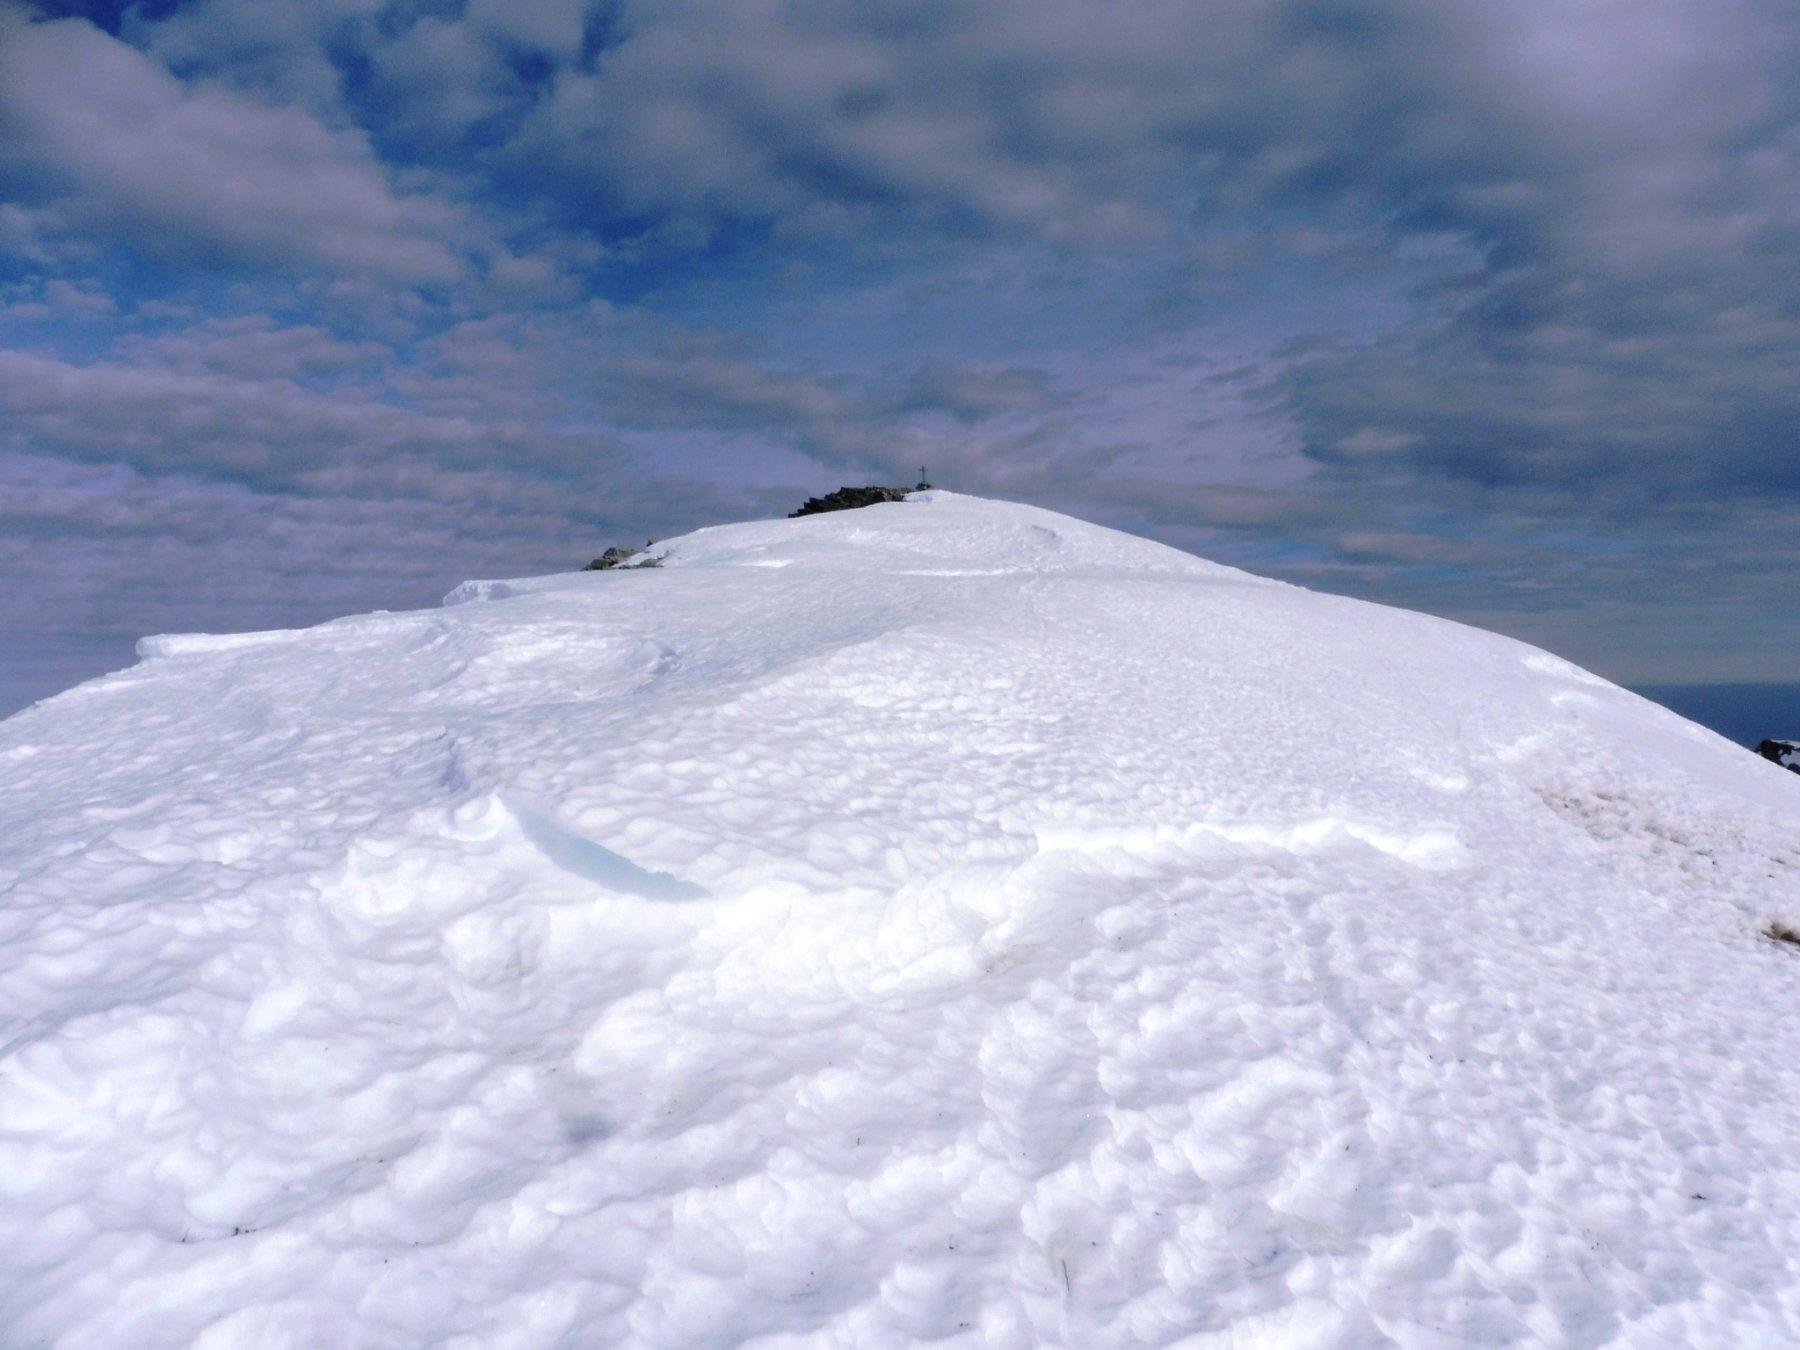 la cupola finale